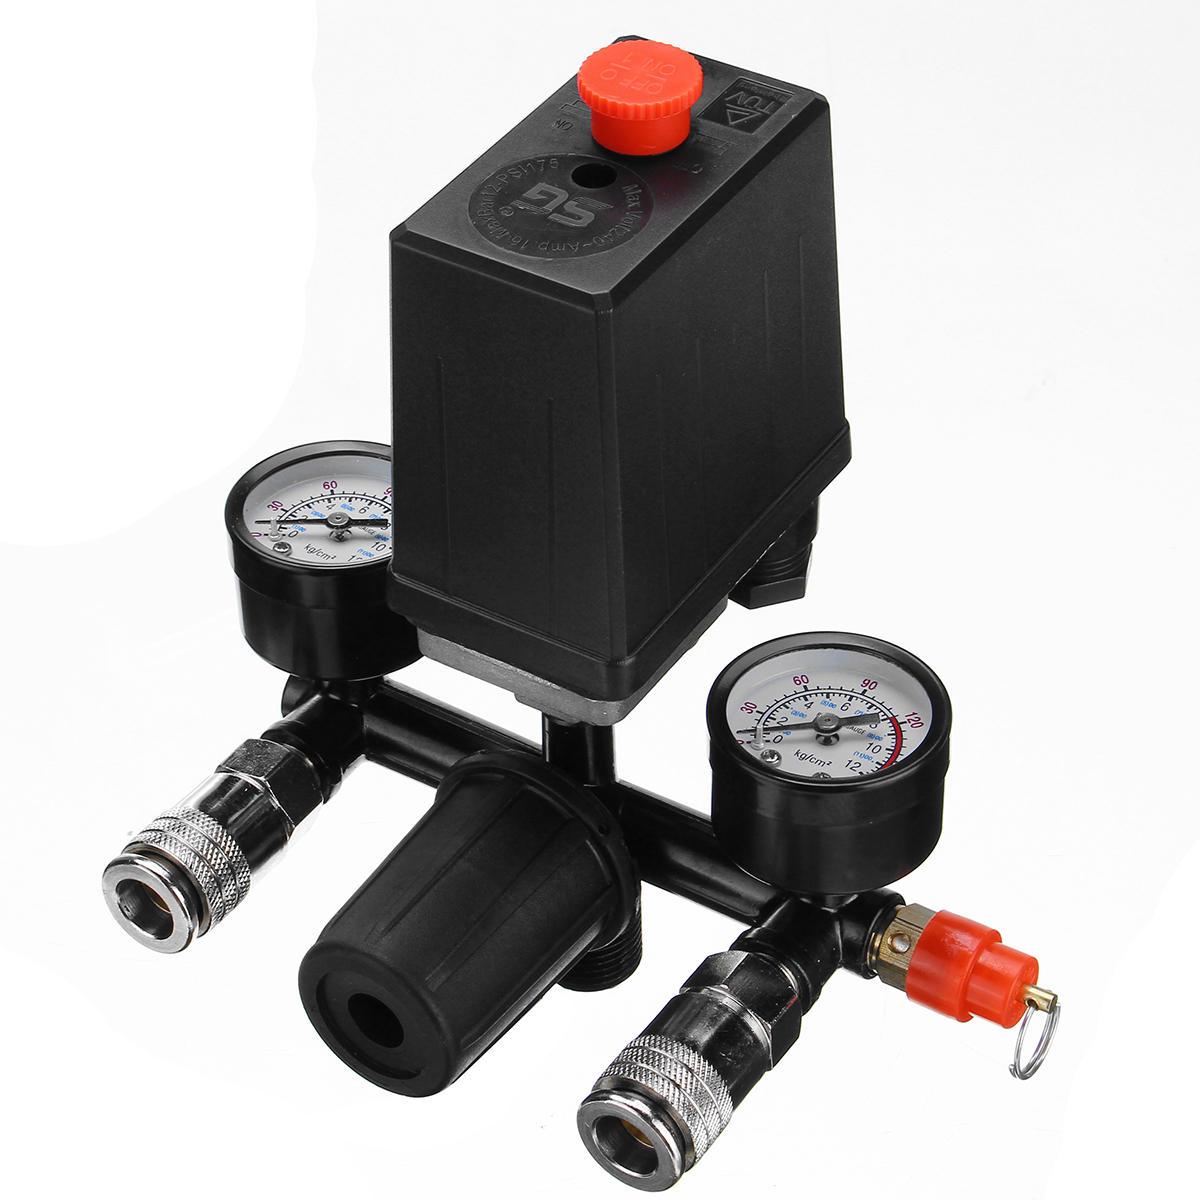 Air Compressor Pressure Switch Control Valve Manifold Regulator Gauges With Quick Connector